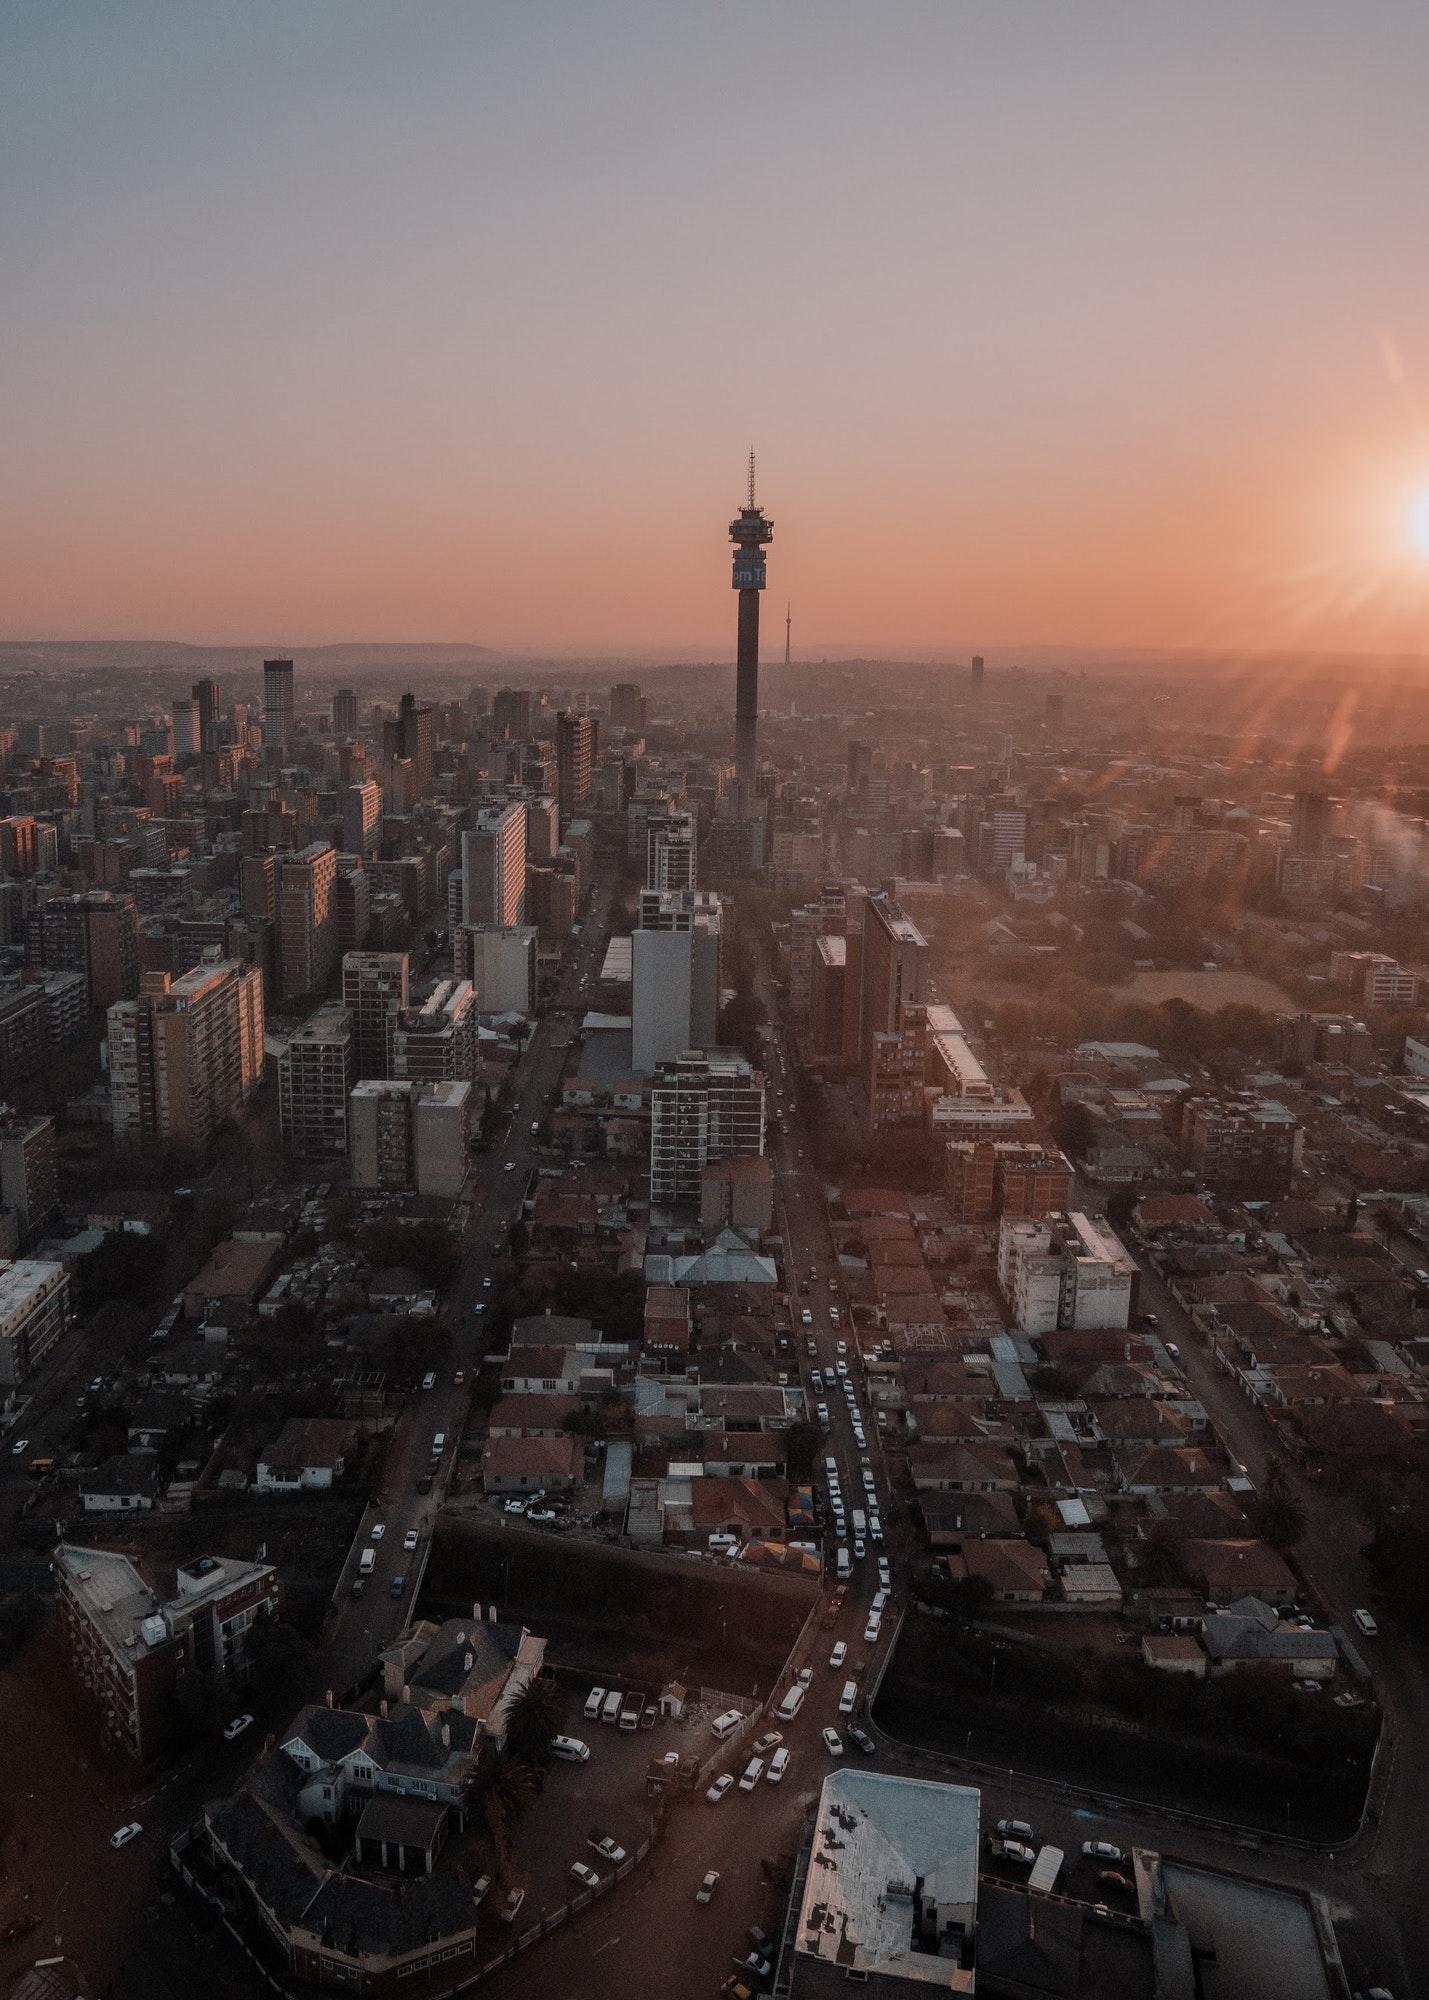 Sunset over Johannesburg during helicopter flight